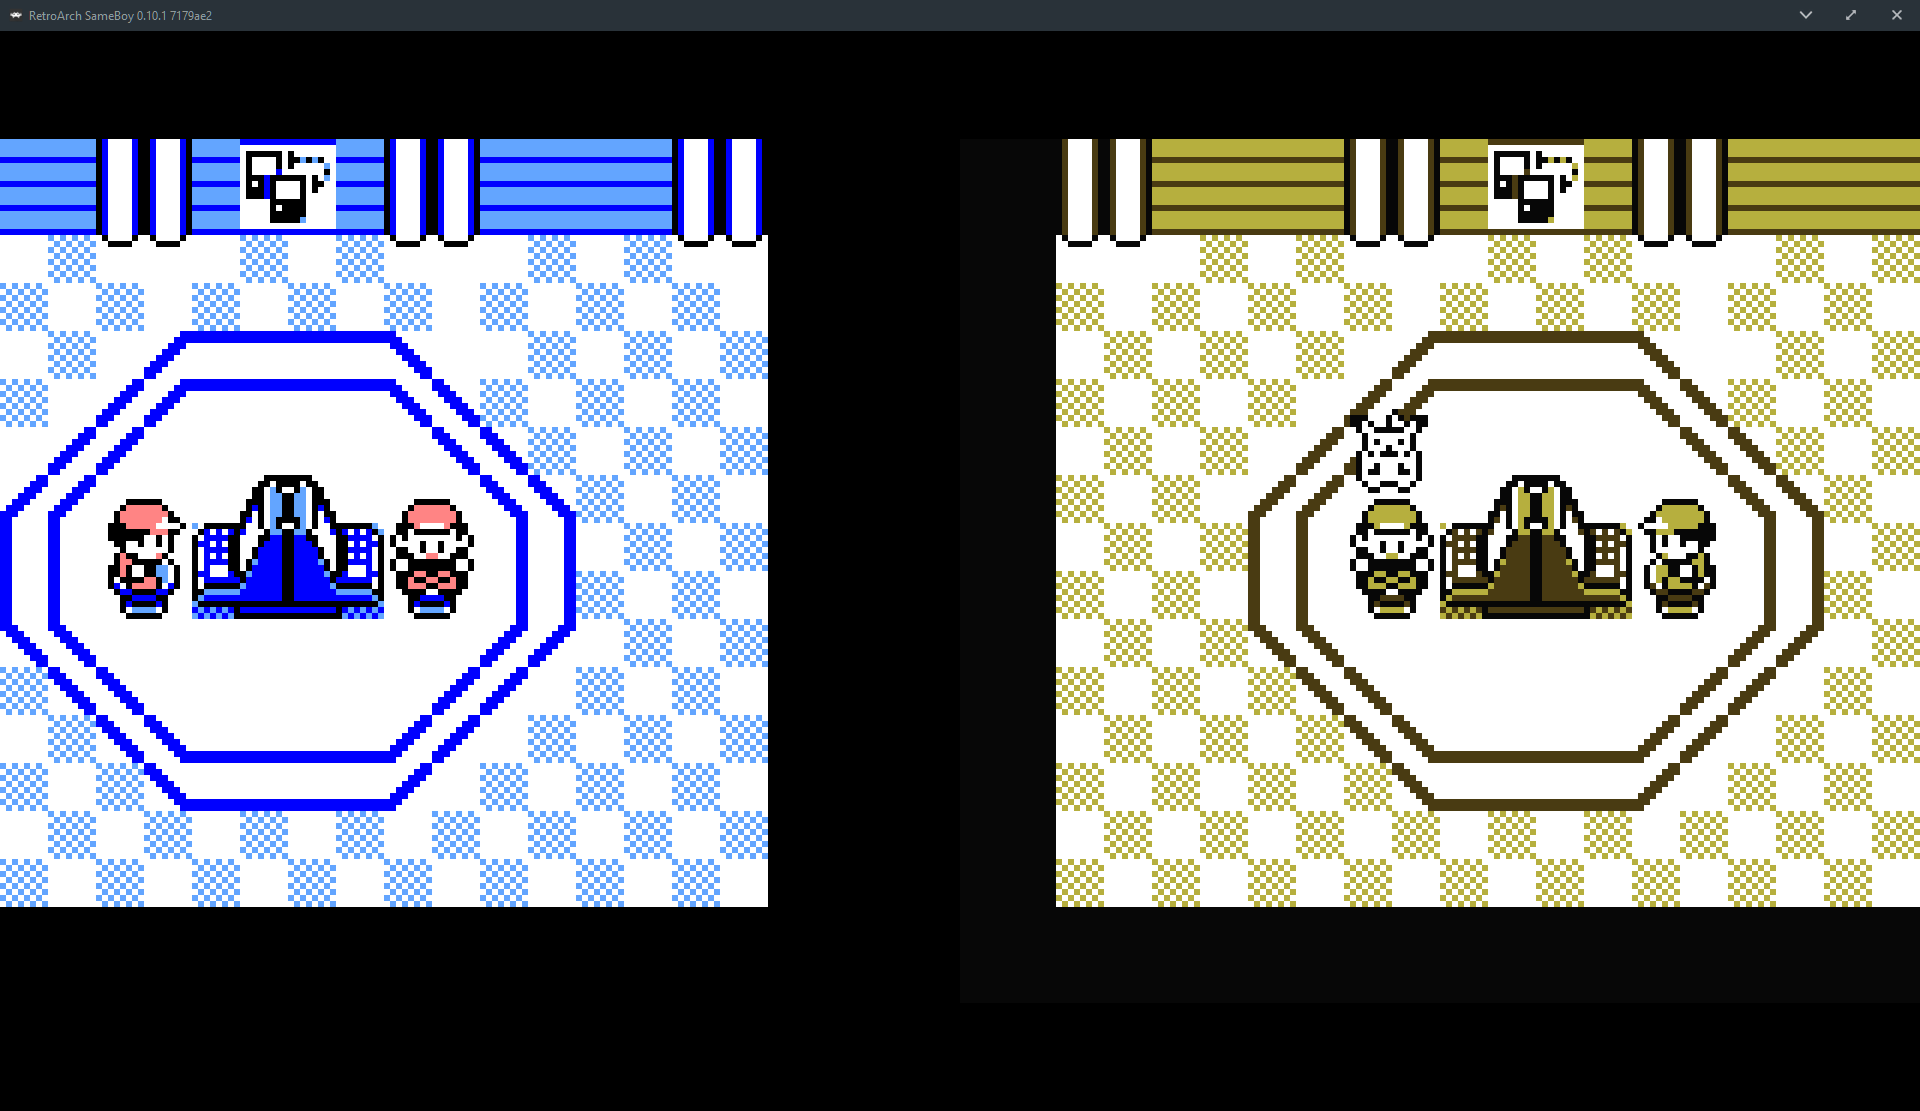 How to trade pokemon using bgb emulator